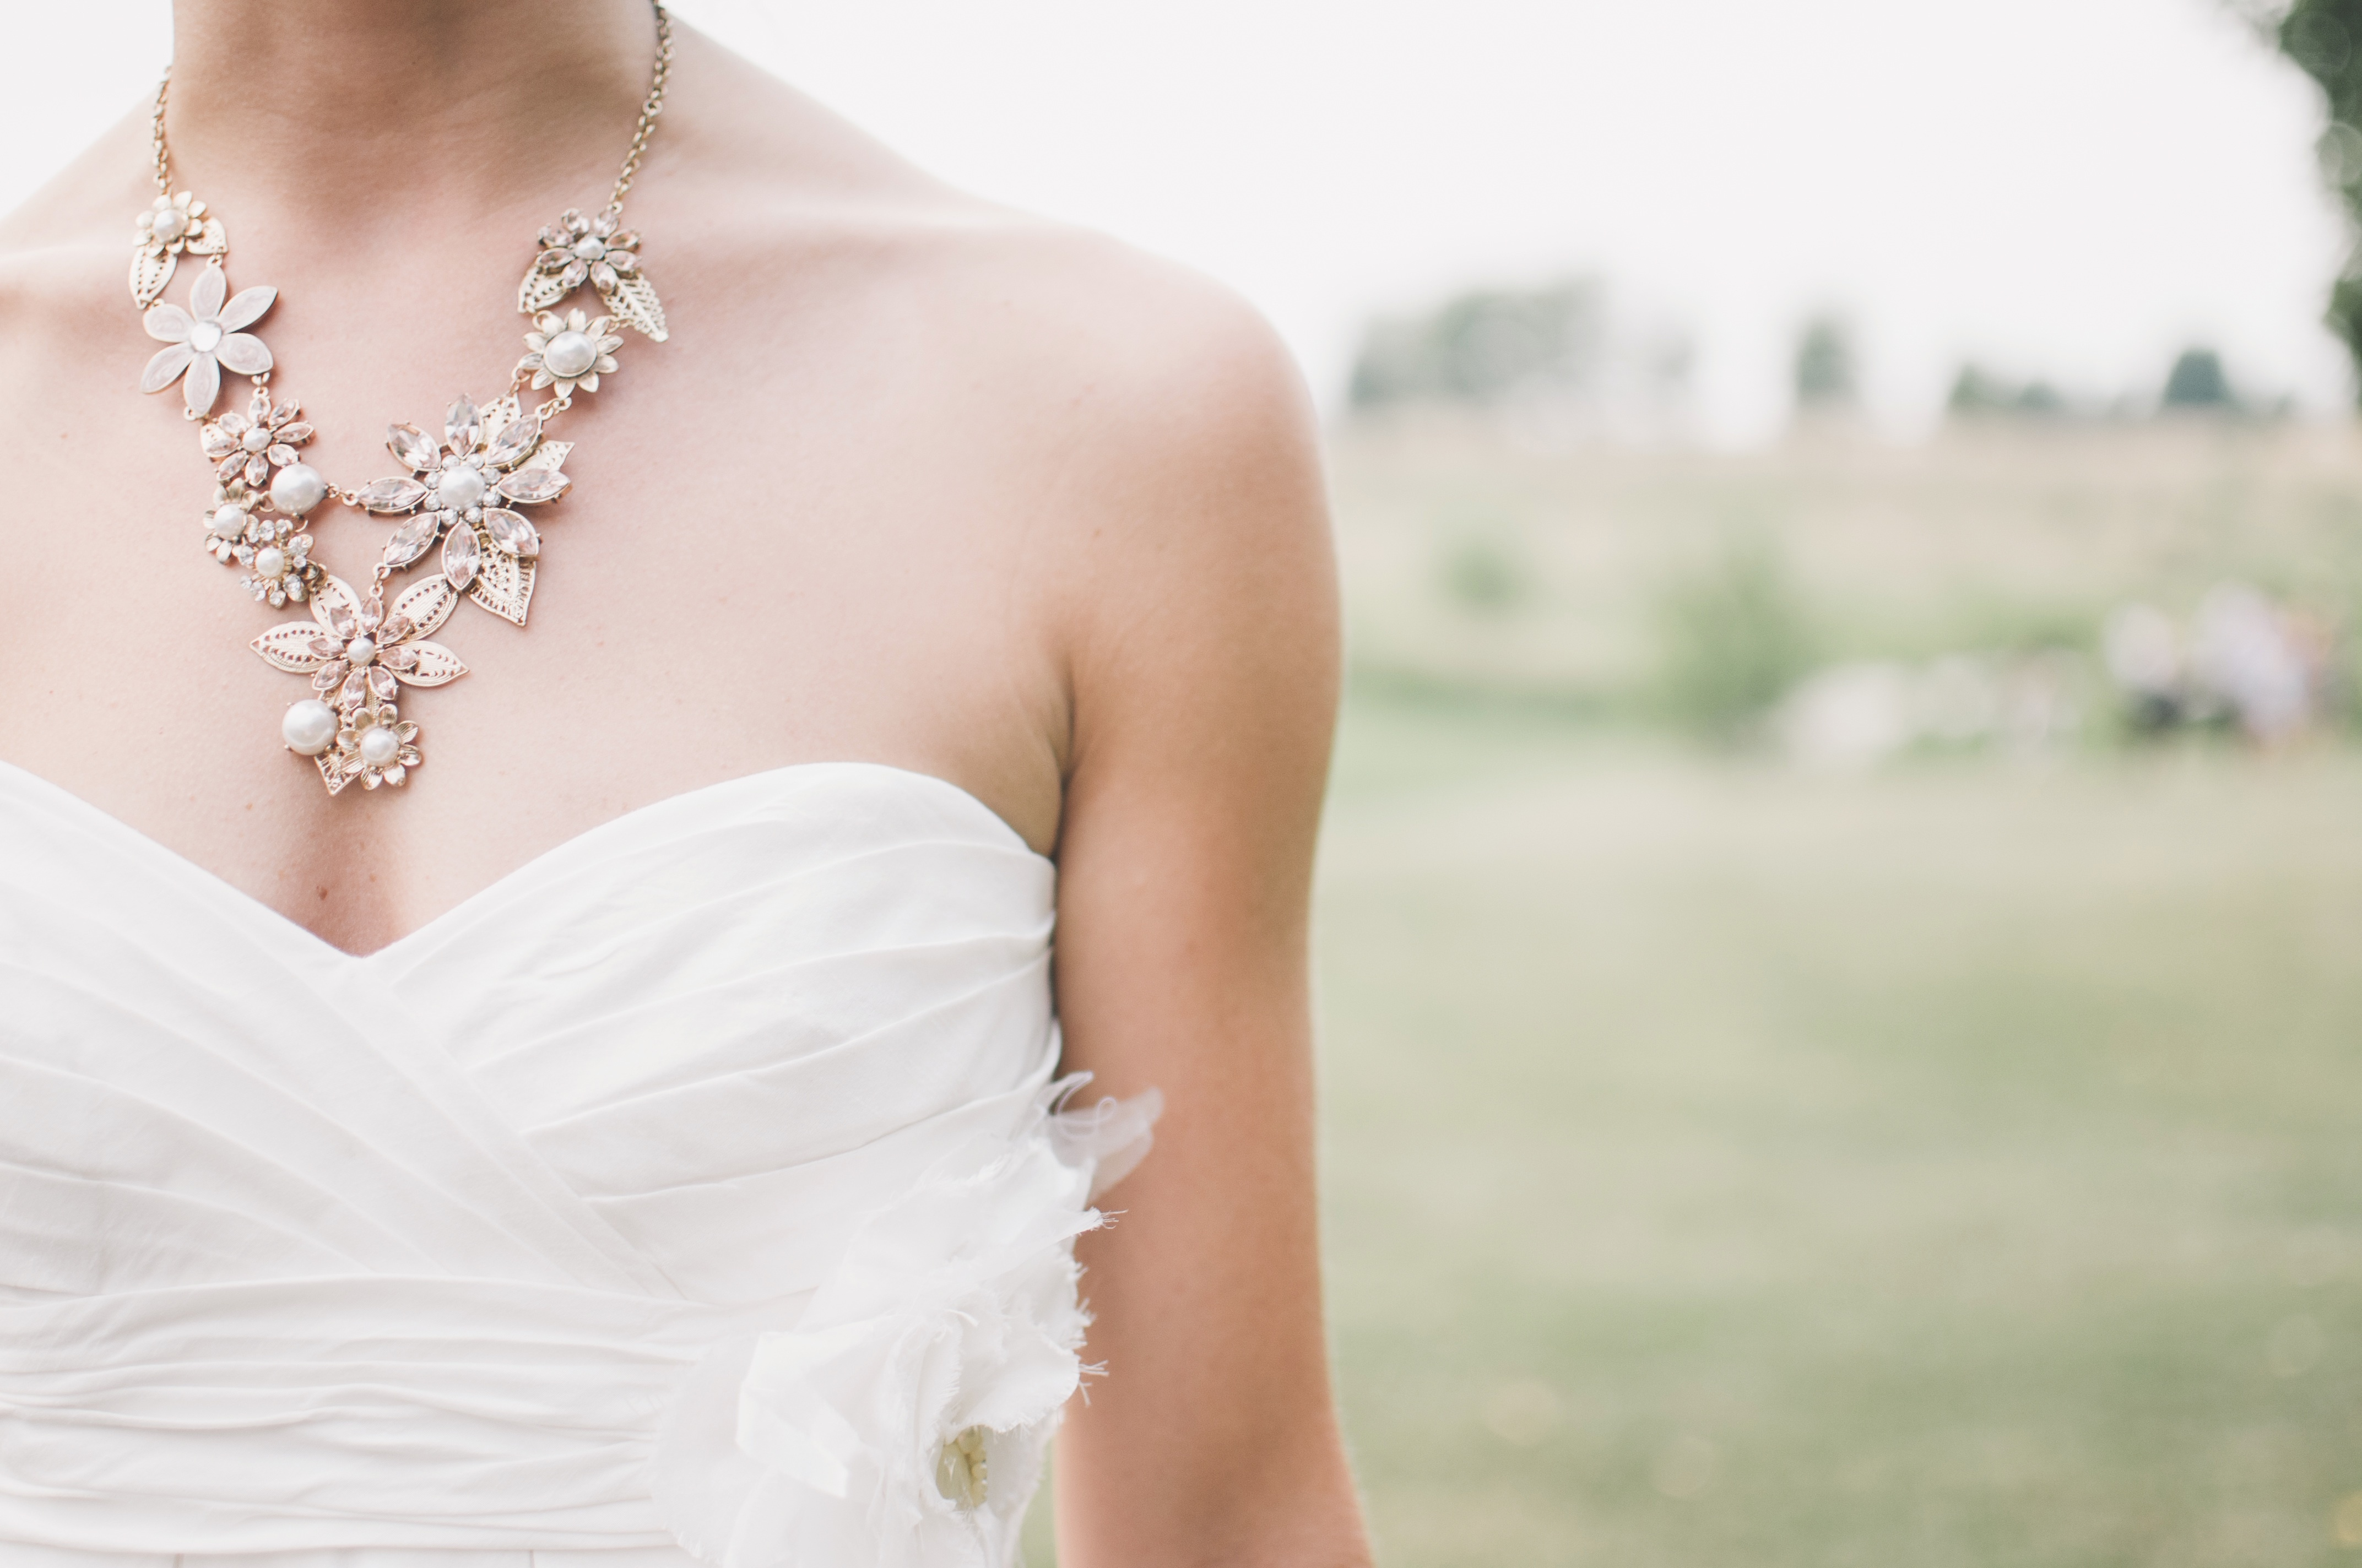 Bridal jewelry and wedding dress